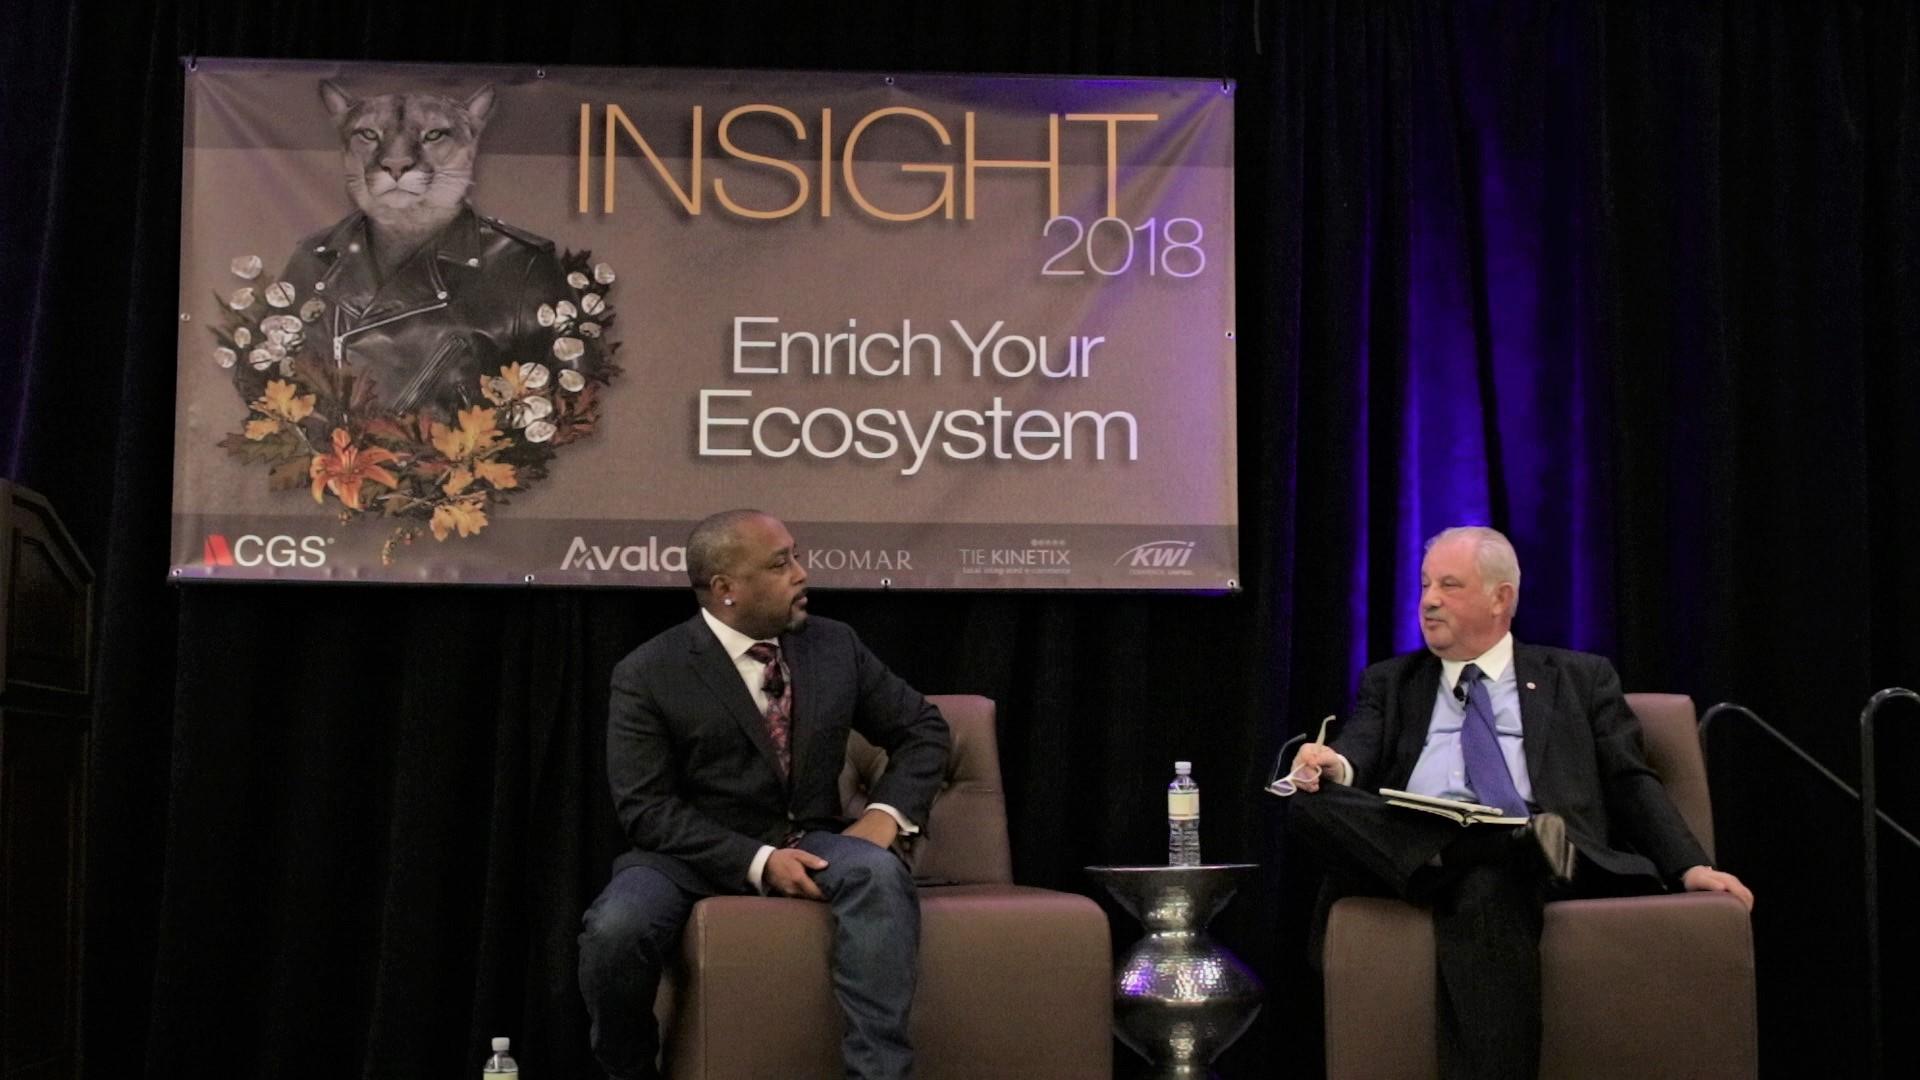 Daymond John and Phil Friedman speak at INSIGHT 2018